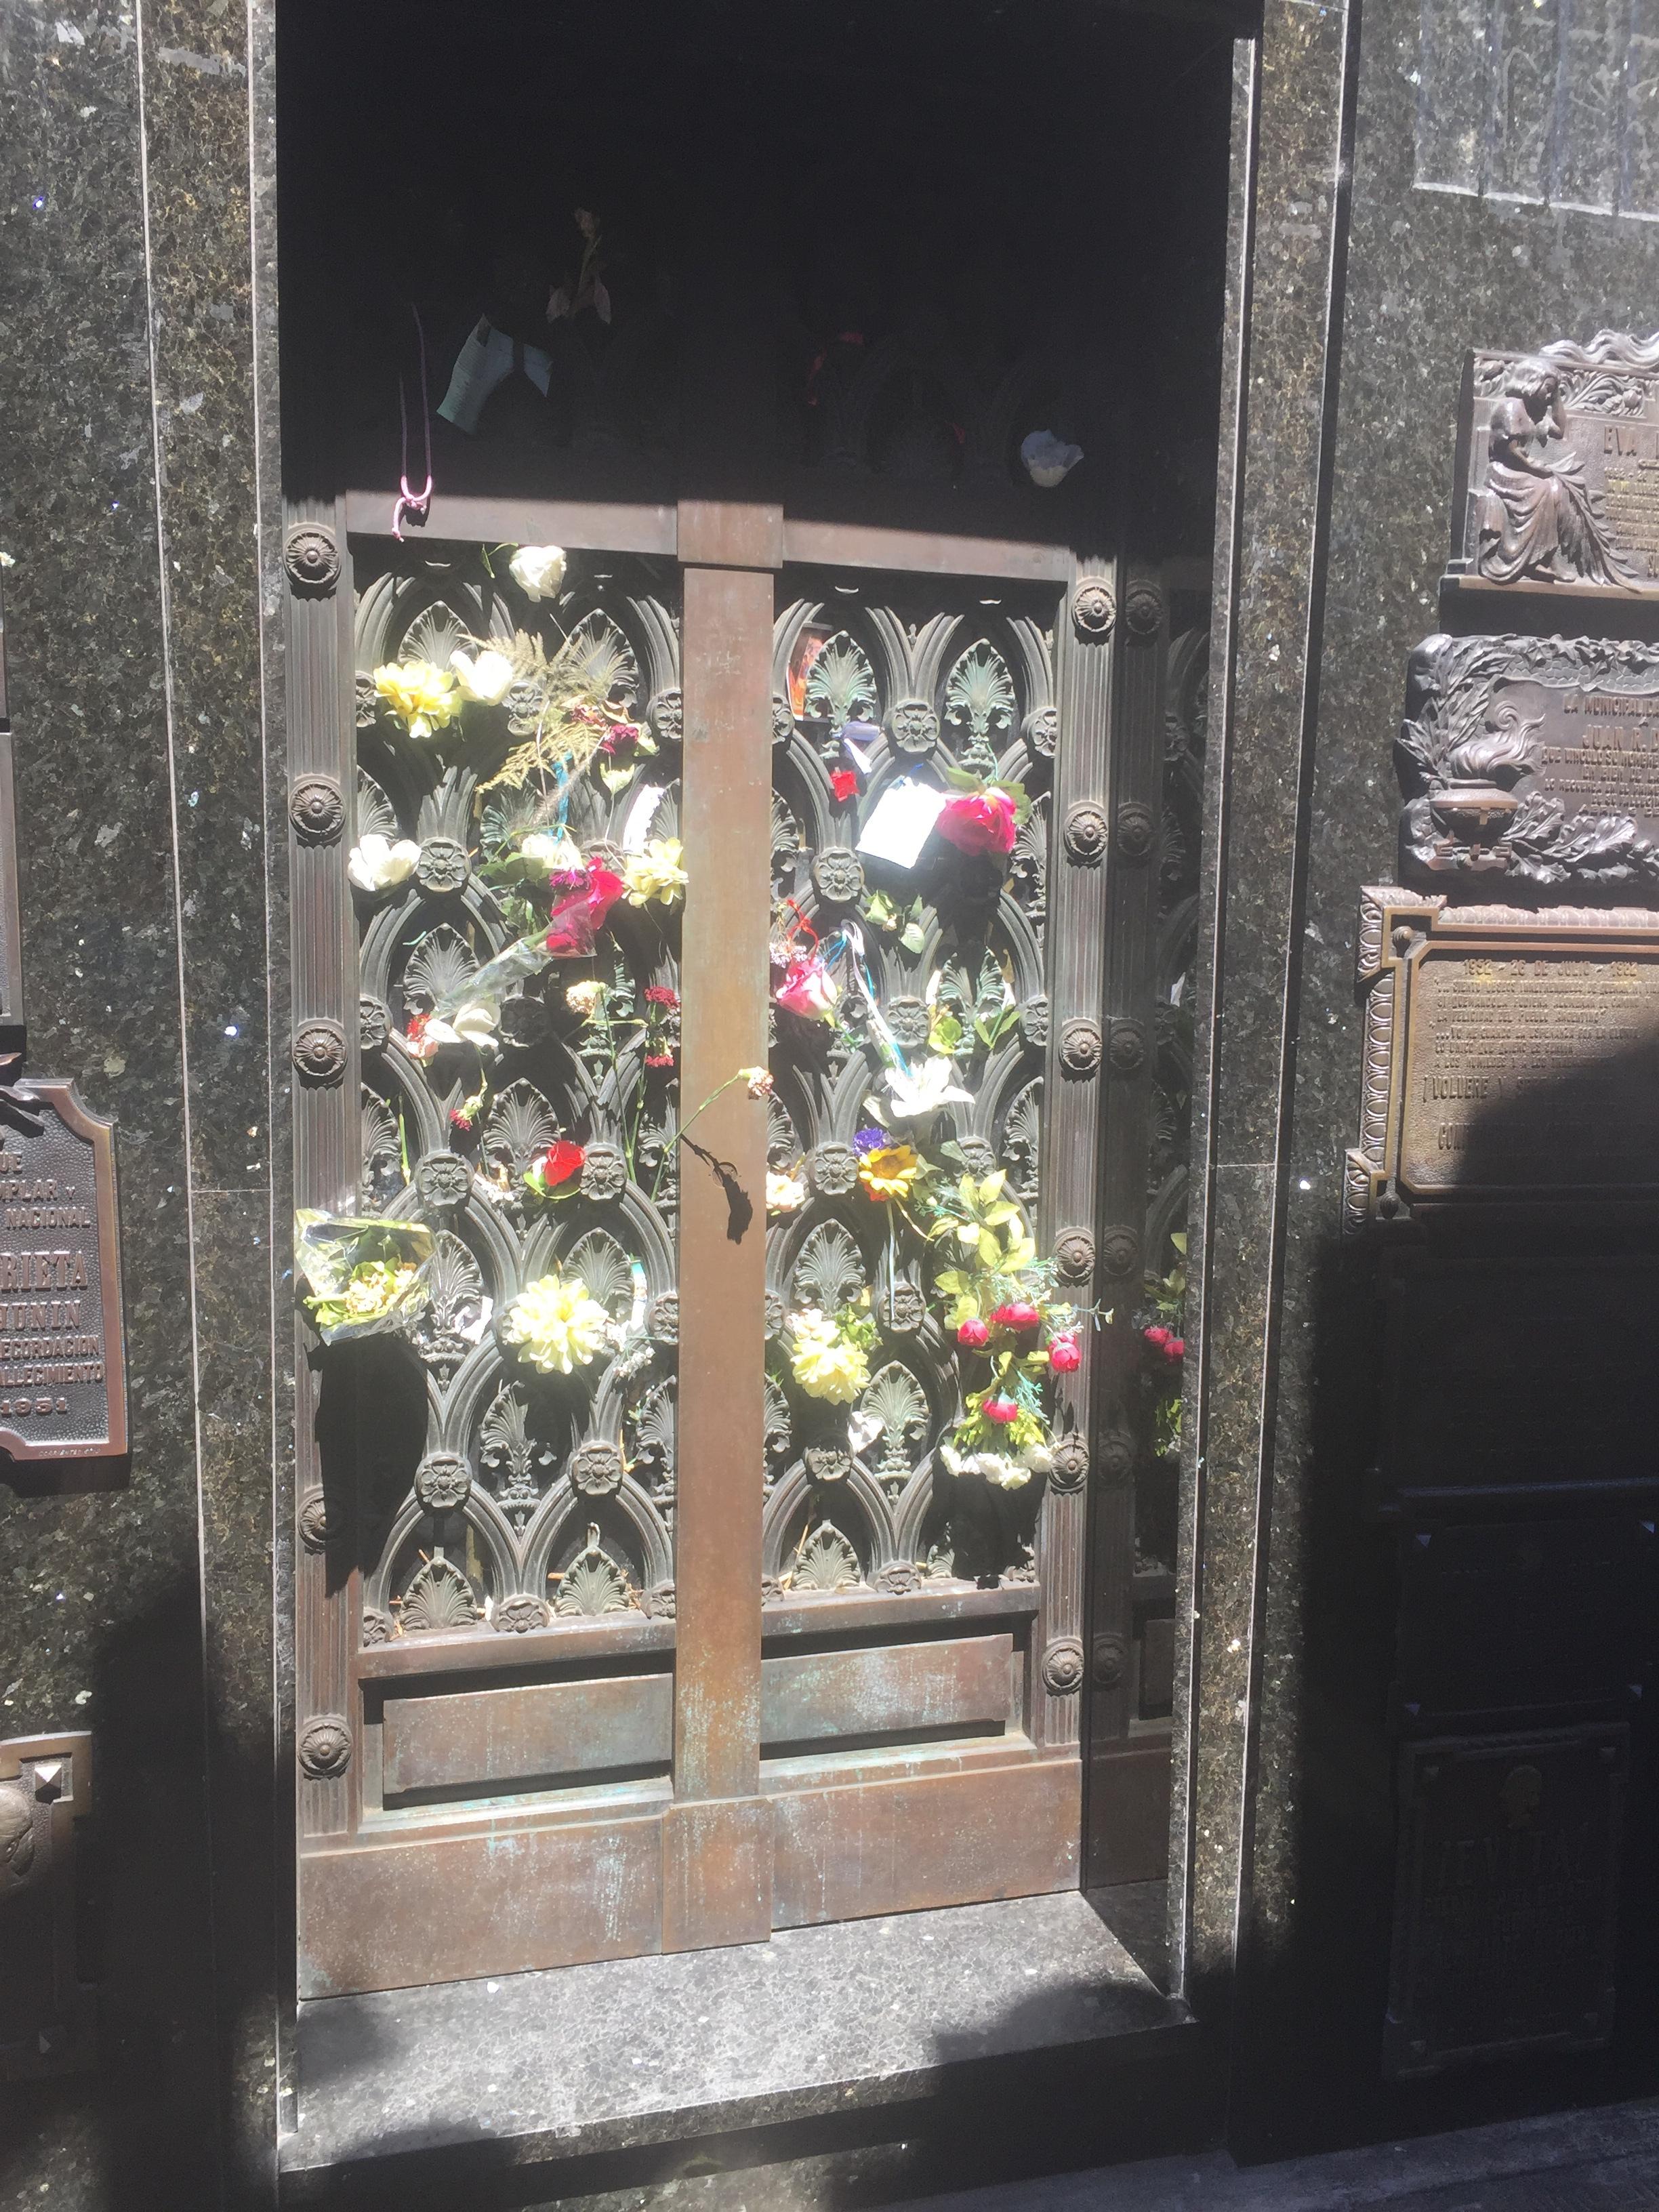 Eva Peron Burial site